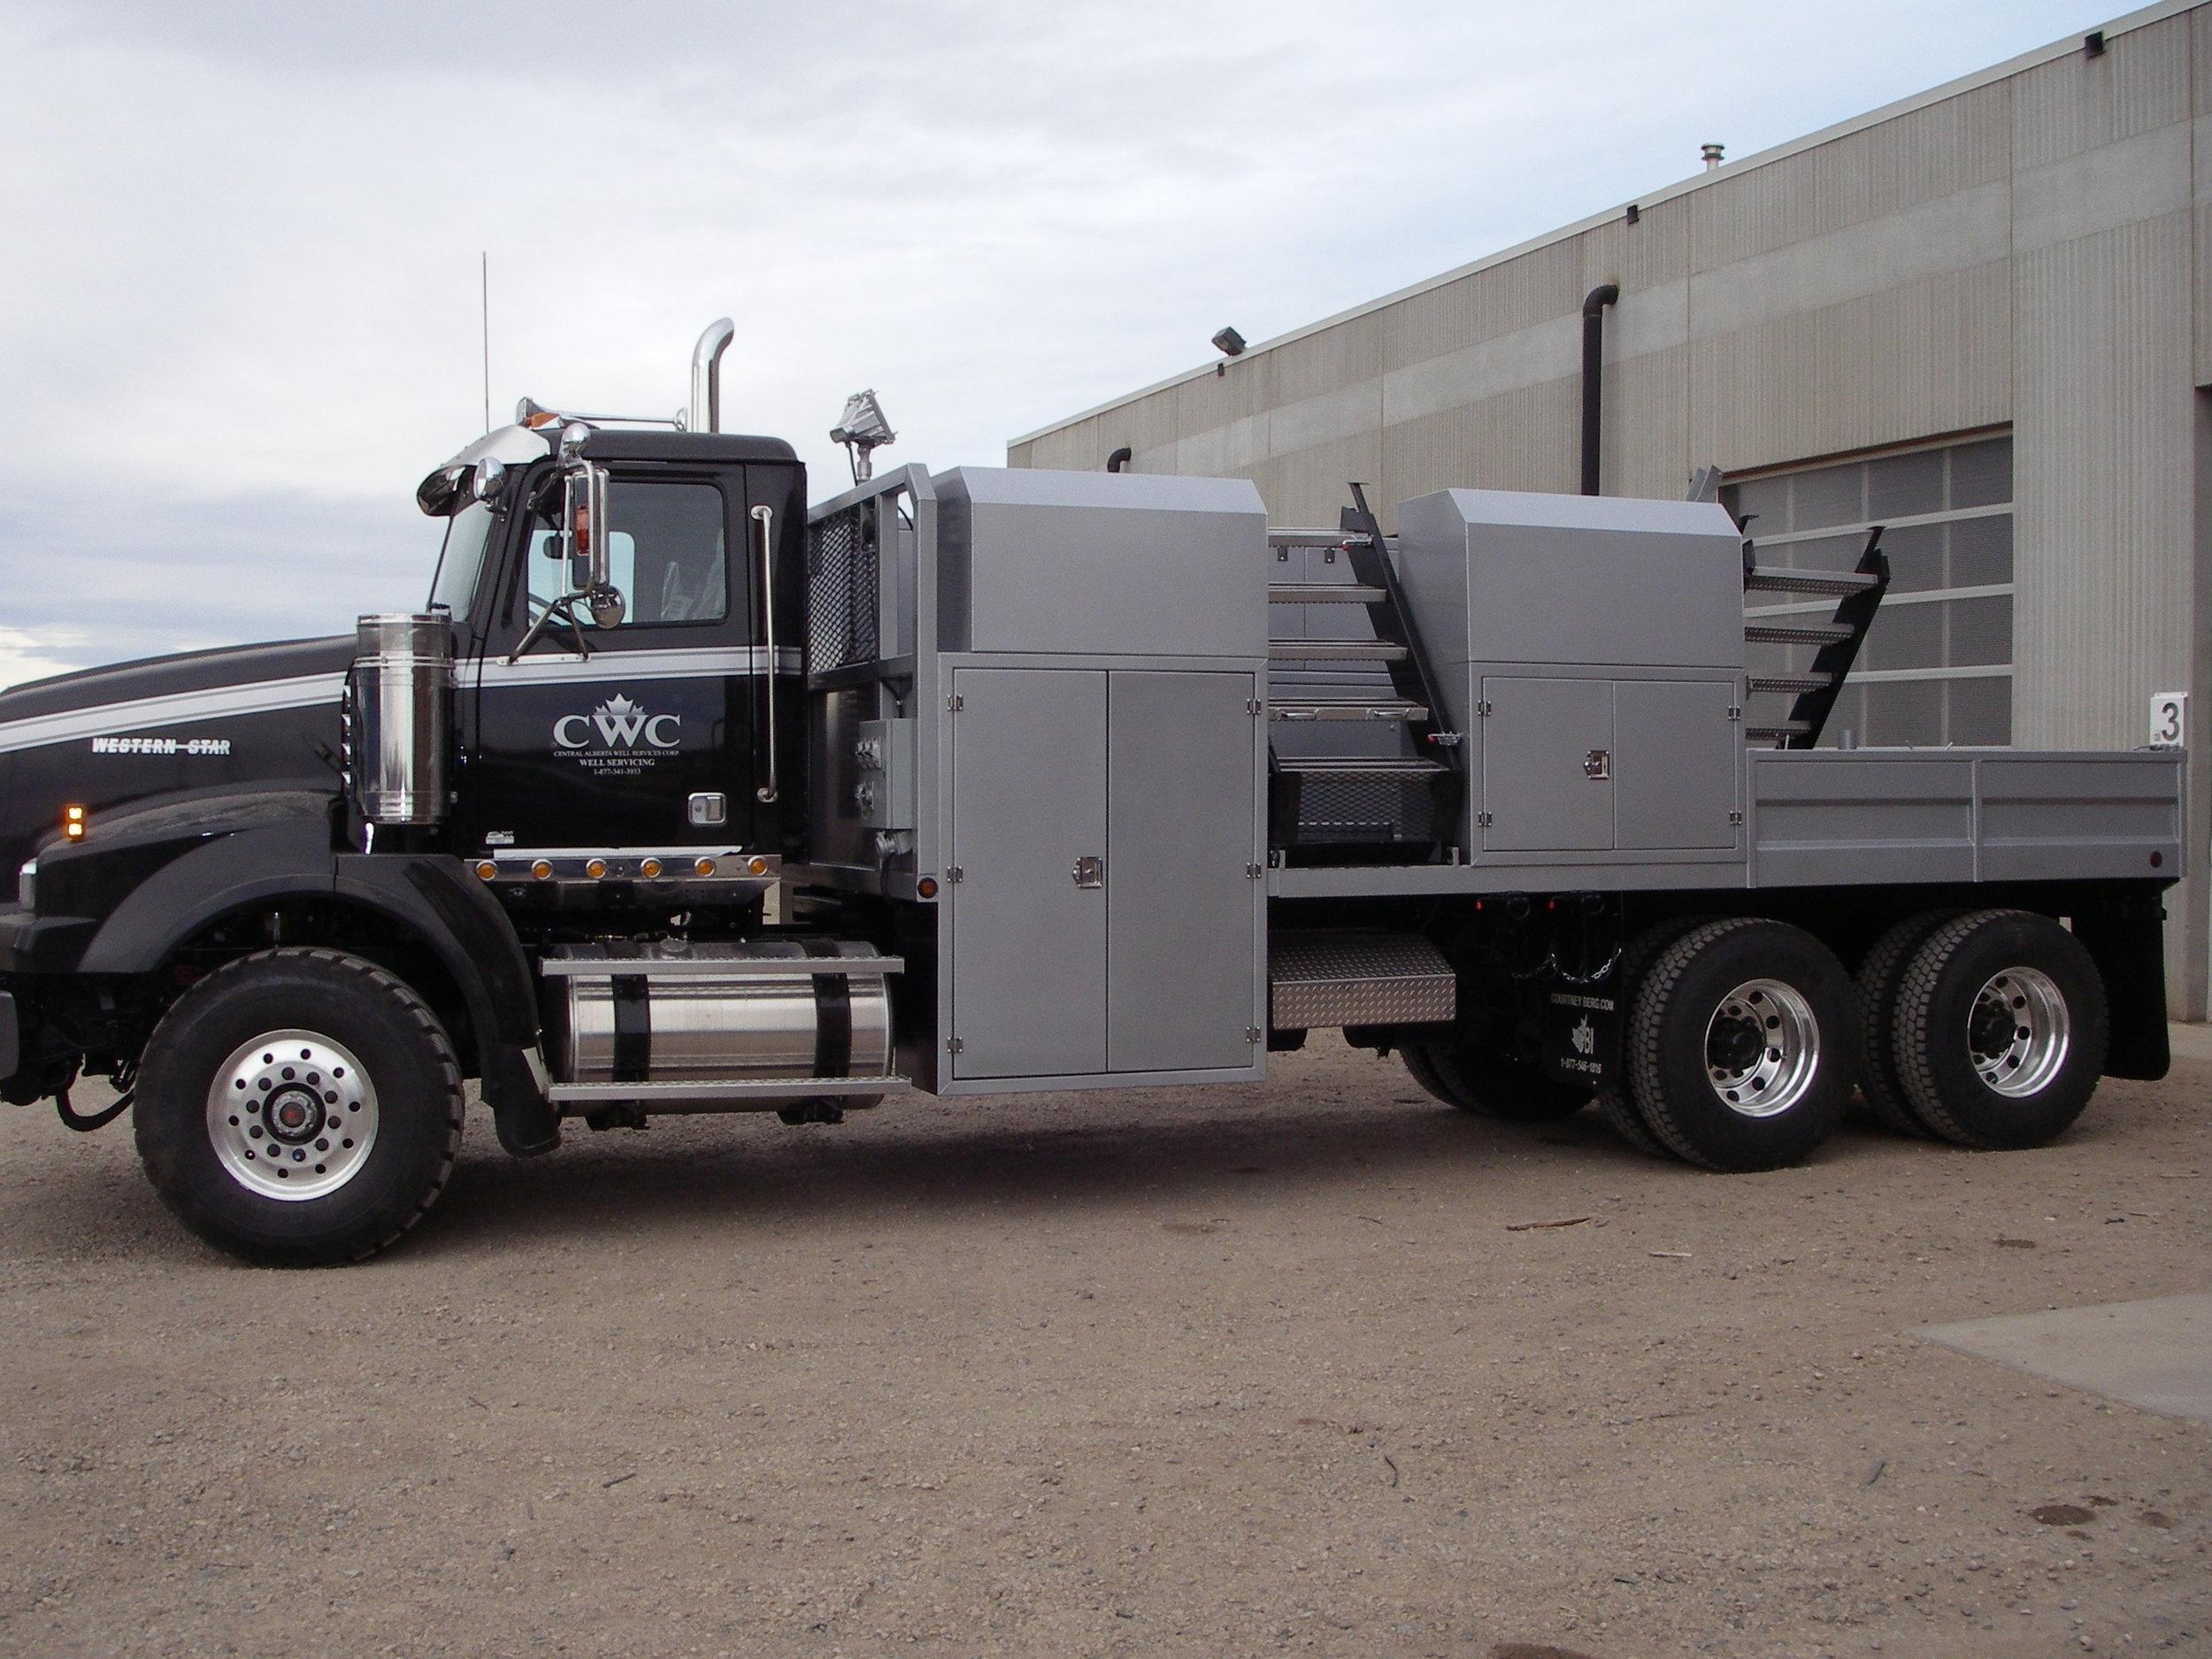 Equipment Truck